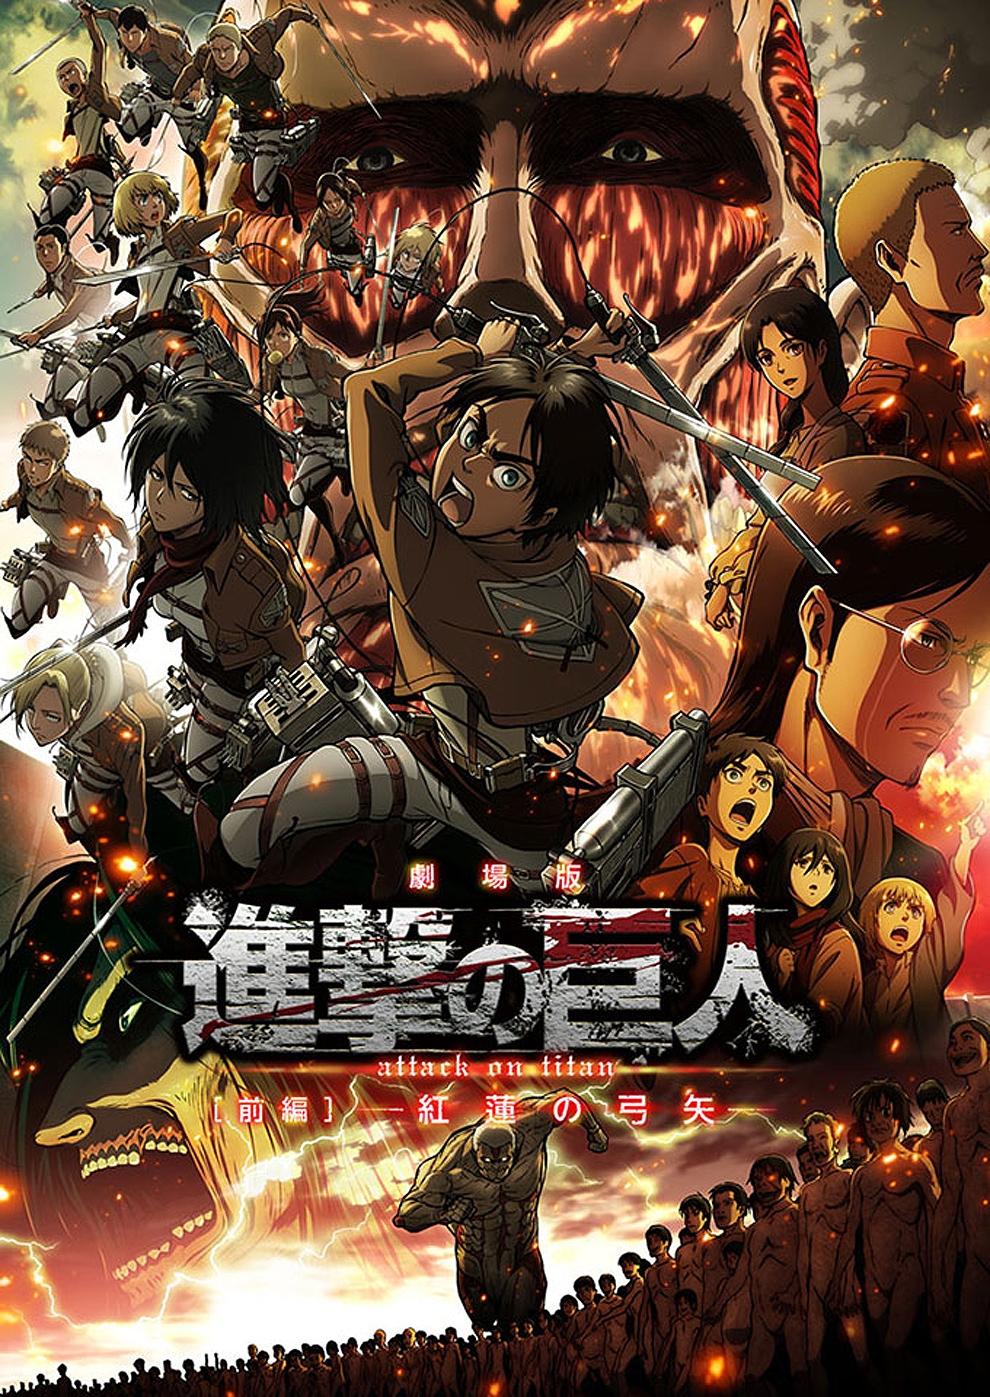 Anime Night: Attack on Titan - Crimson Bow and Arrow (Poster)